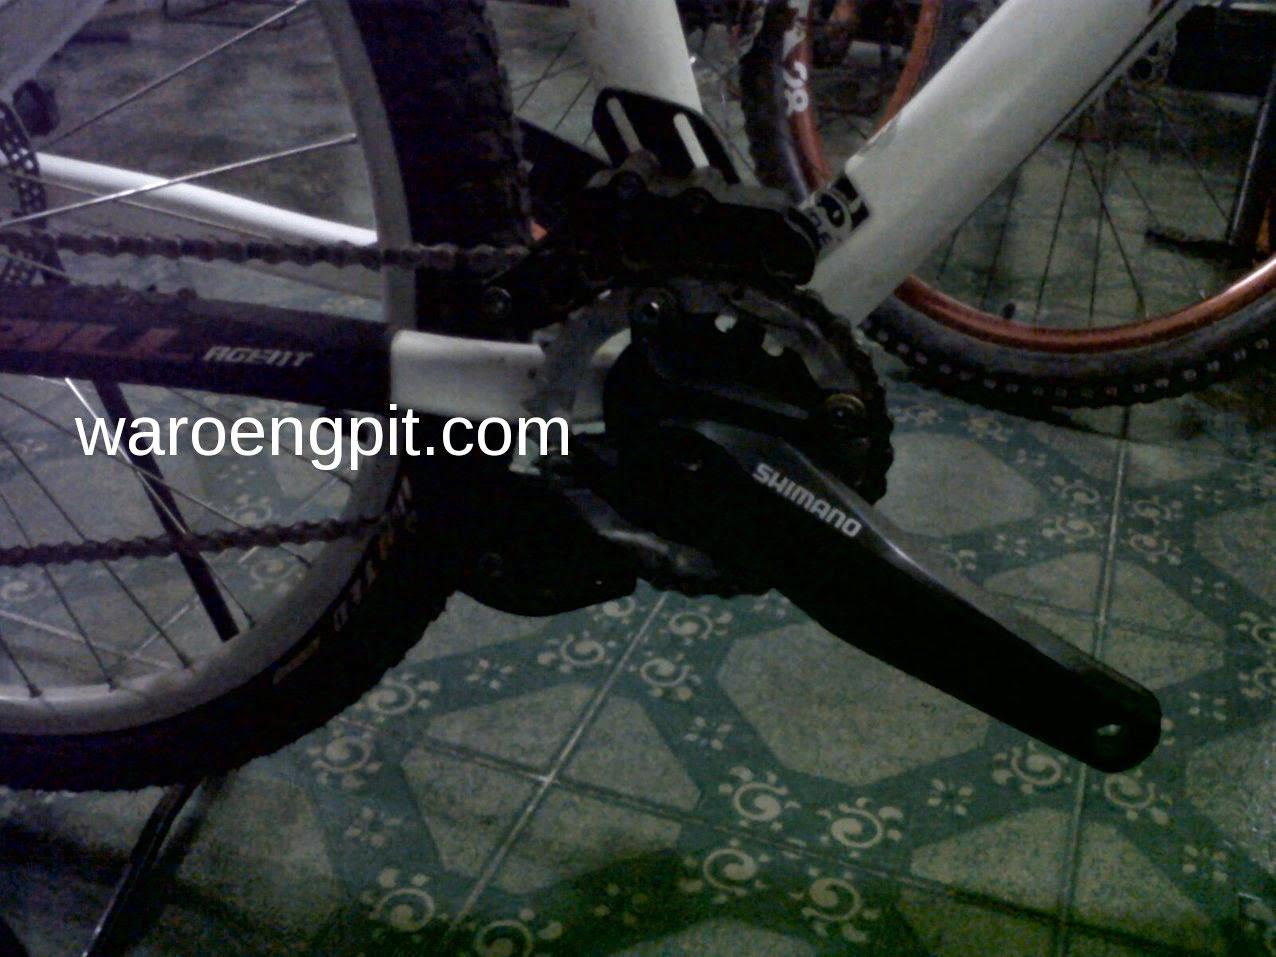 Sepeda Gunung Rakitan merek Thrill 4x 2012 Bekas-5